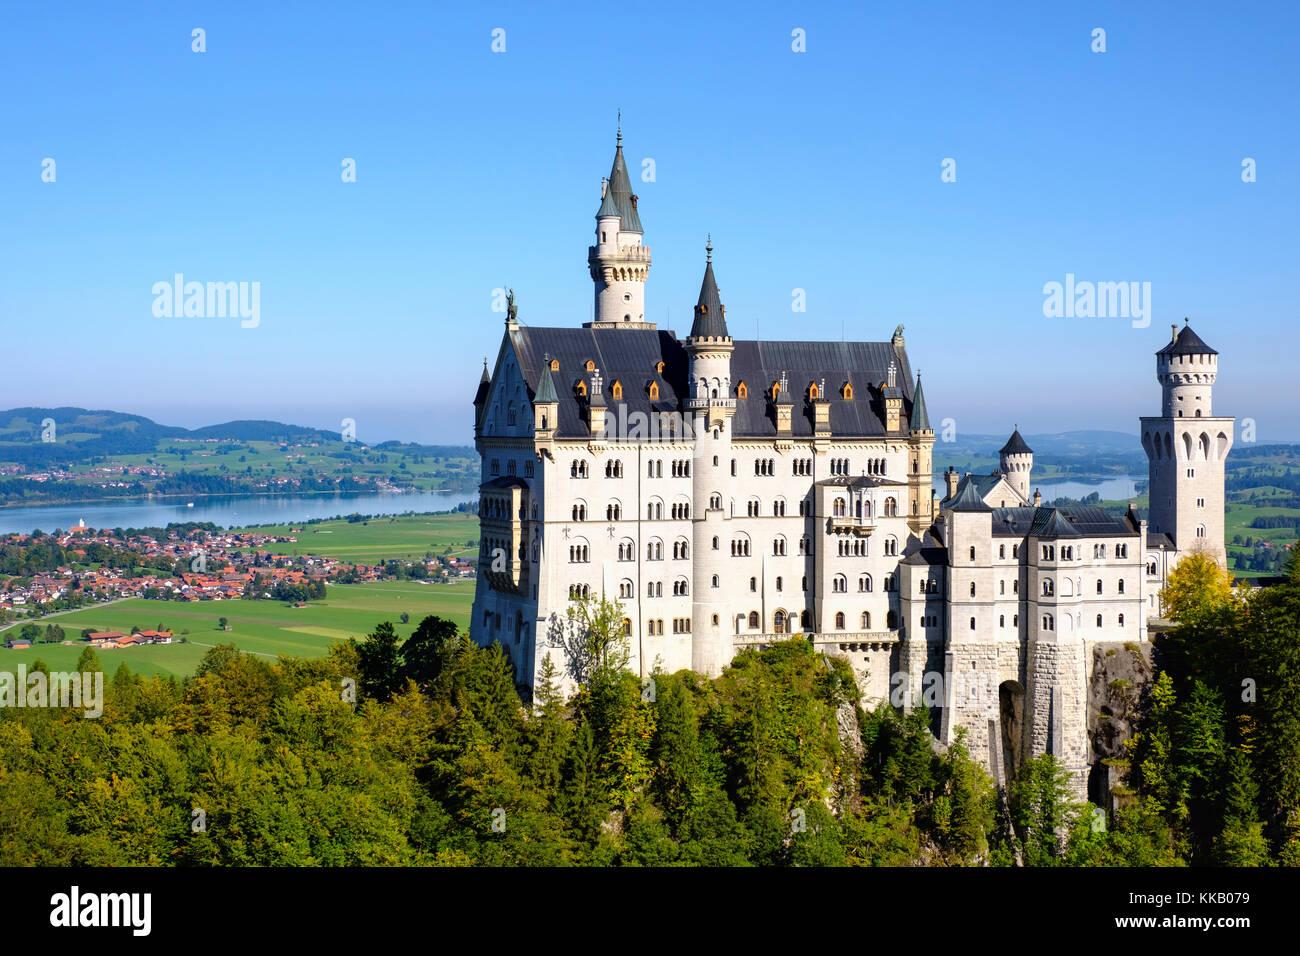 El castillo de Neuschwanstein, en la espalda forggensee, schwangau, königswinkel, ostallgäu, allgäu, Imagen De Stock